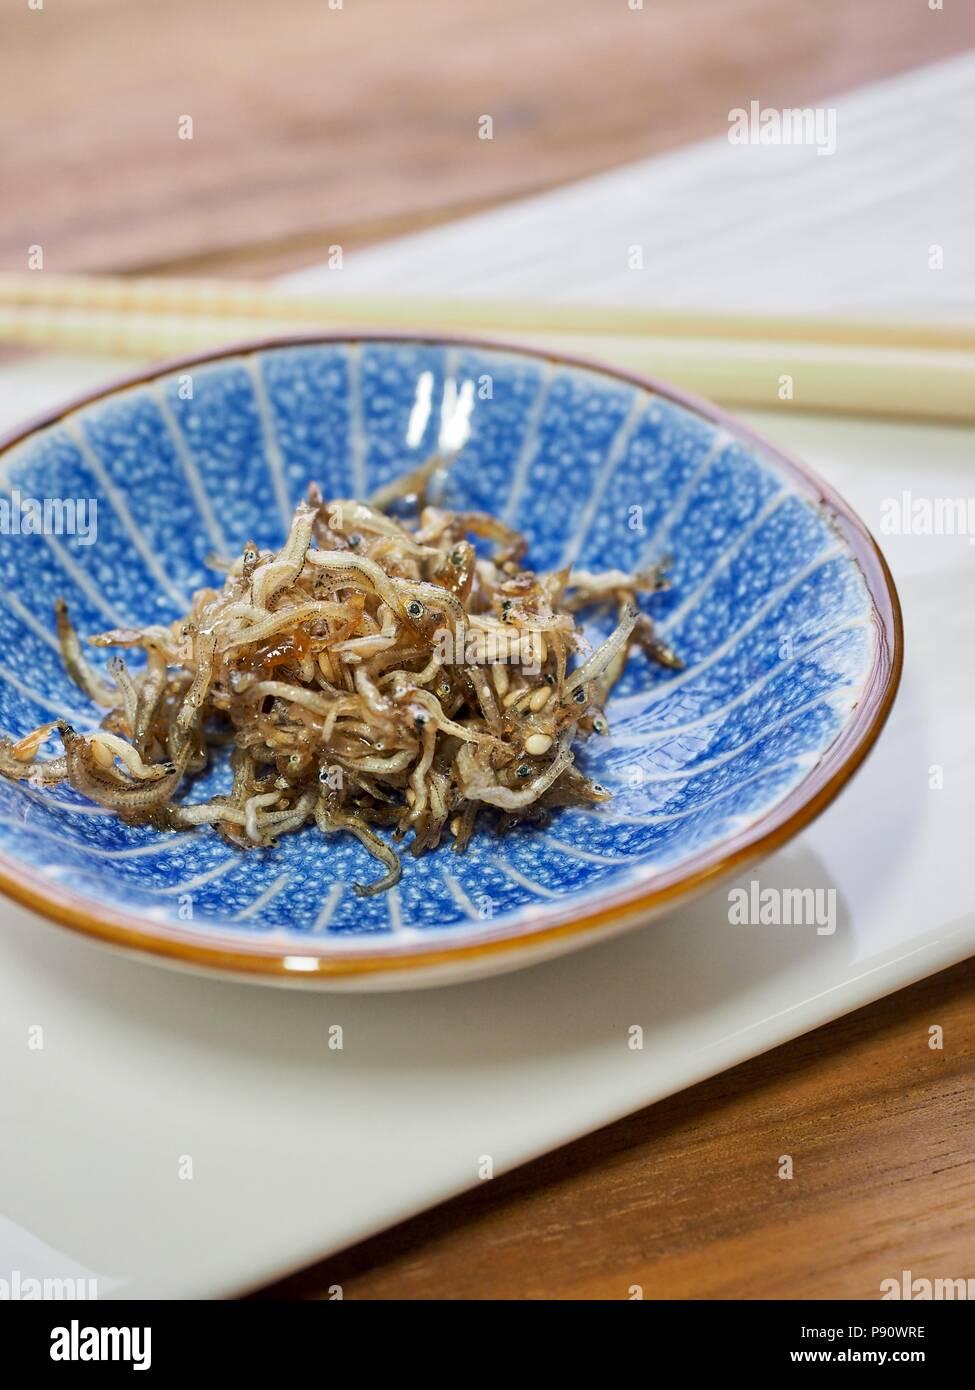 Korean food Stir-fried anchovies - Stock Image